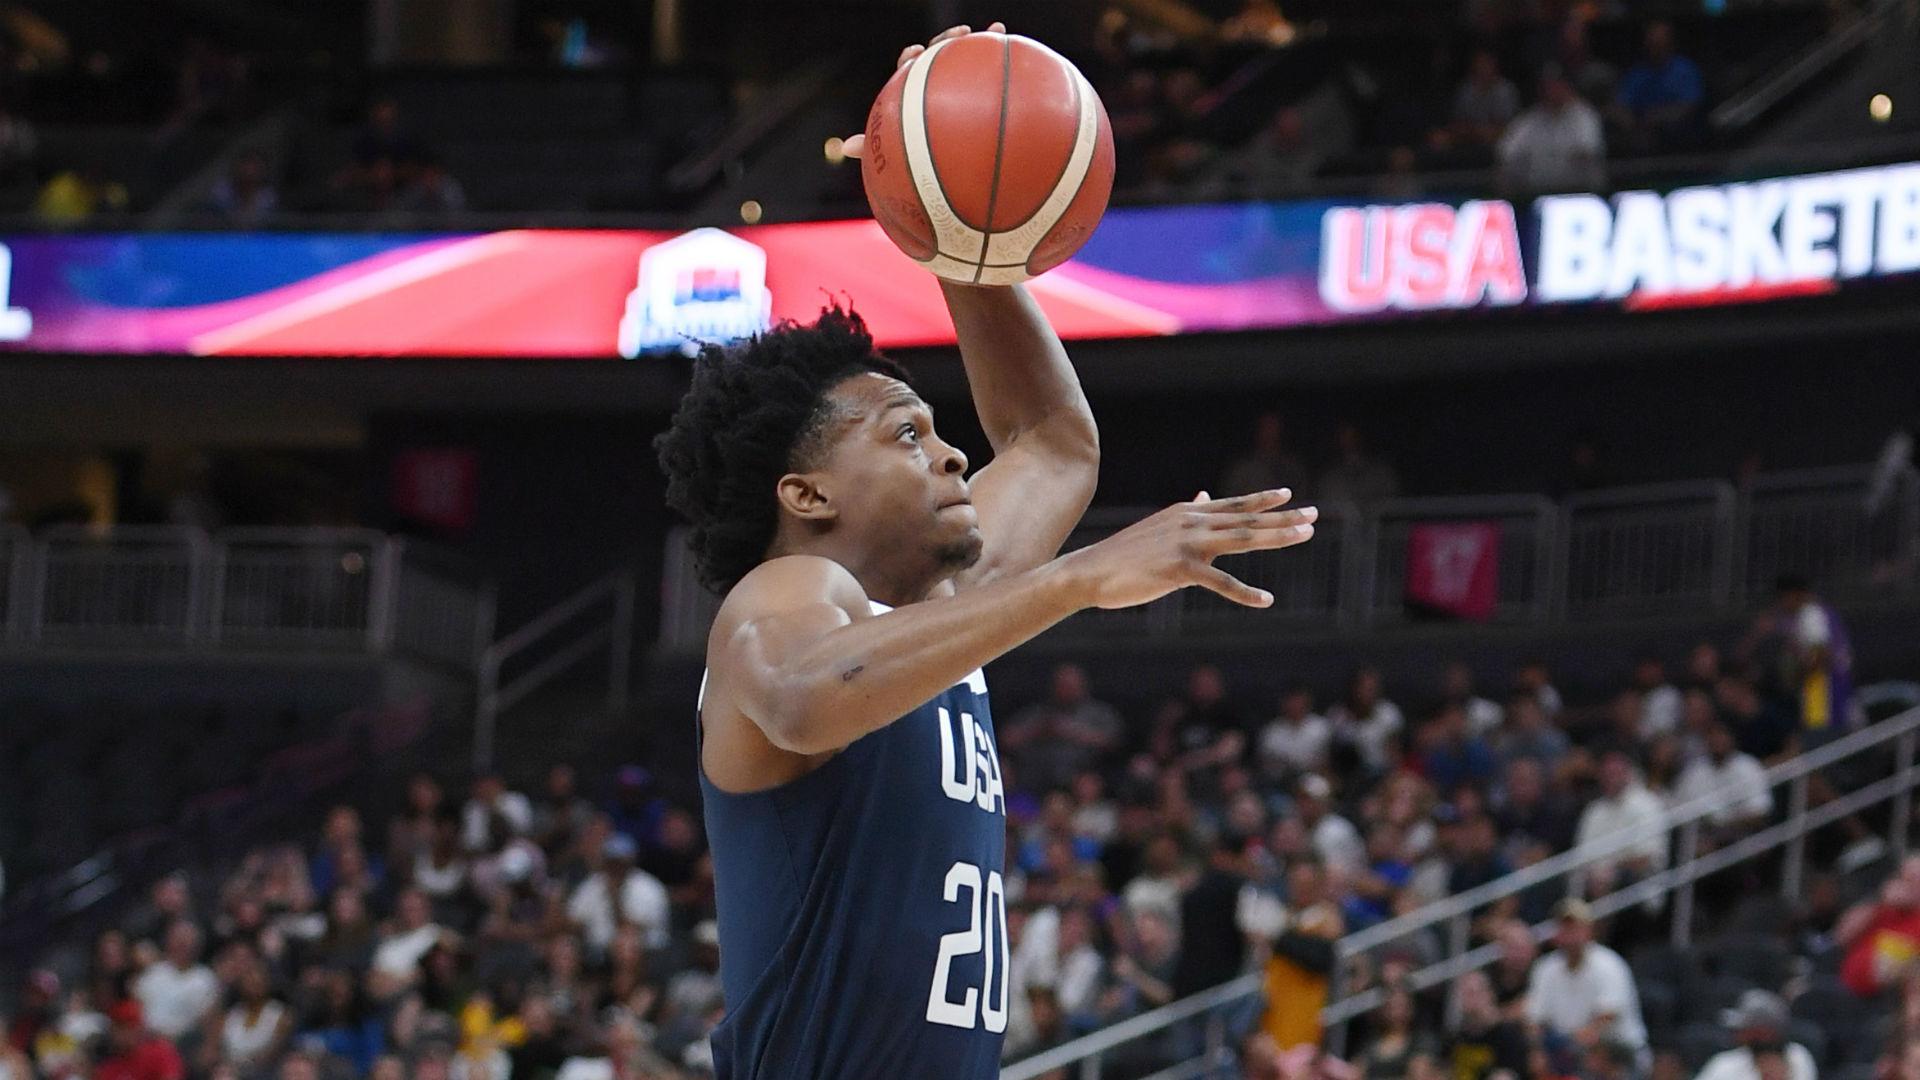 FIBA World Cup 2019: De'Aaron Fox leaves Team USA to focus on making NBA playoffs